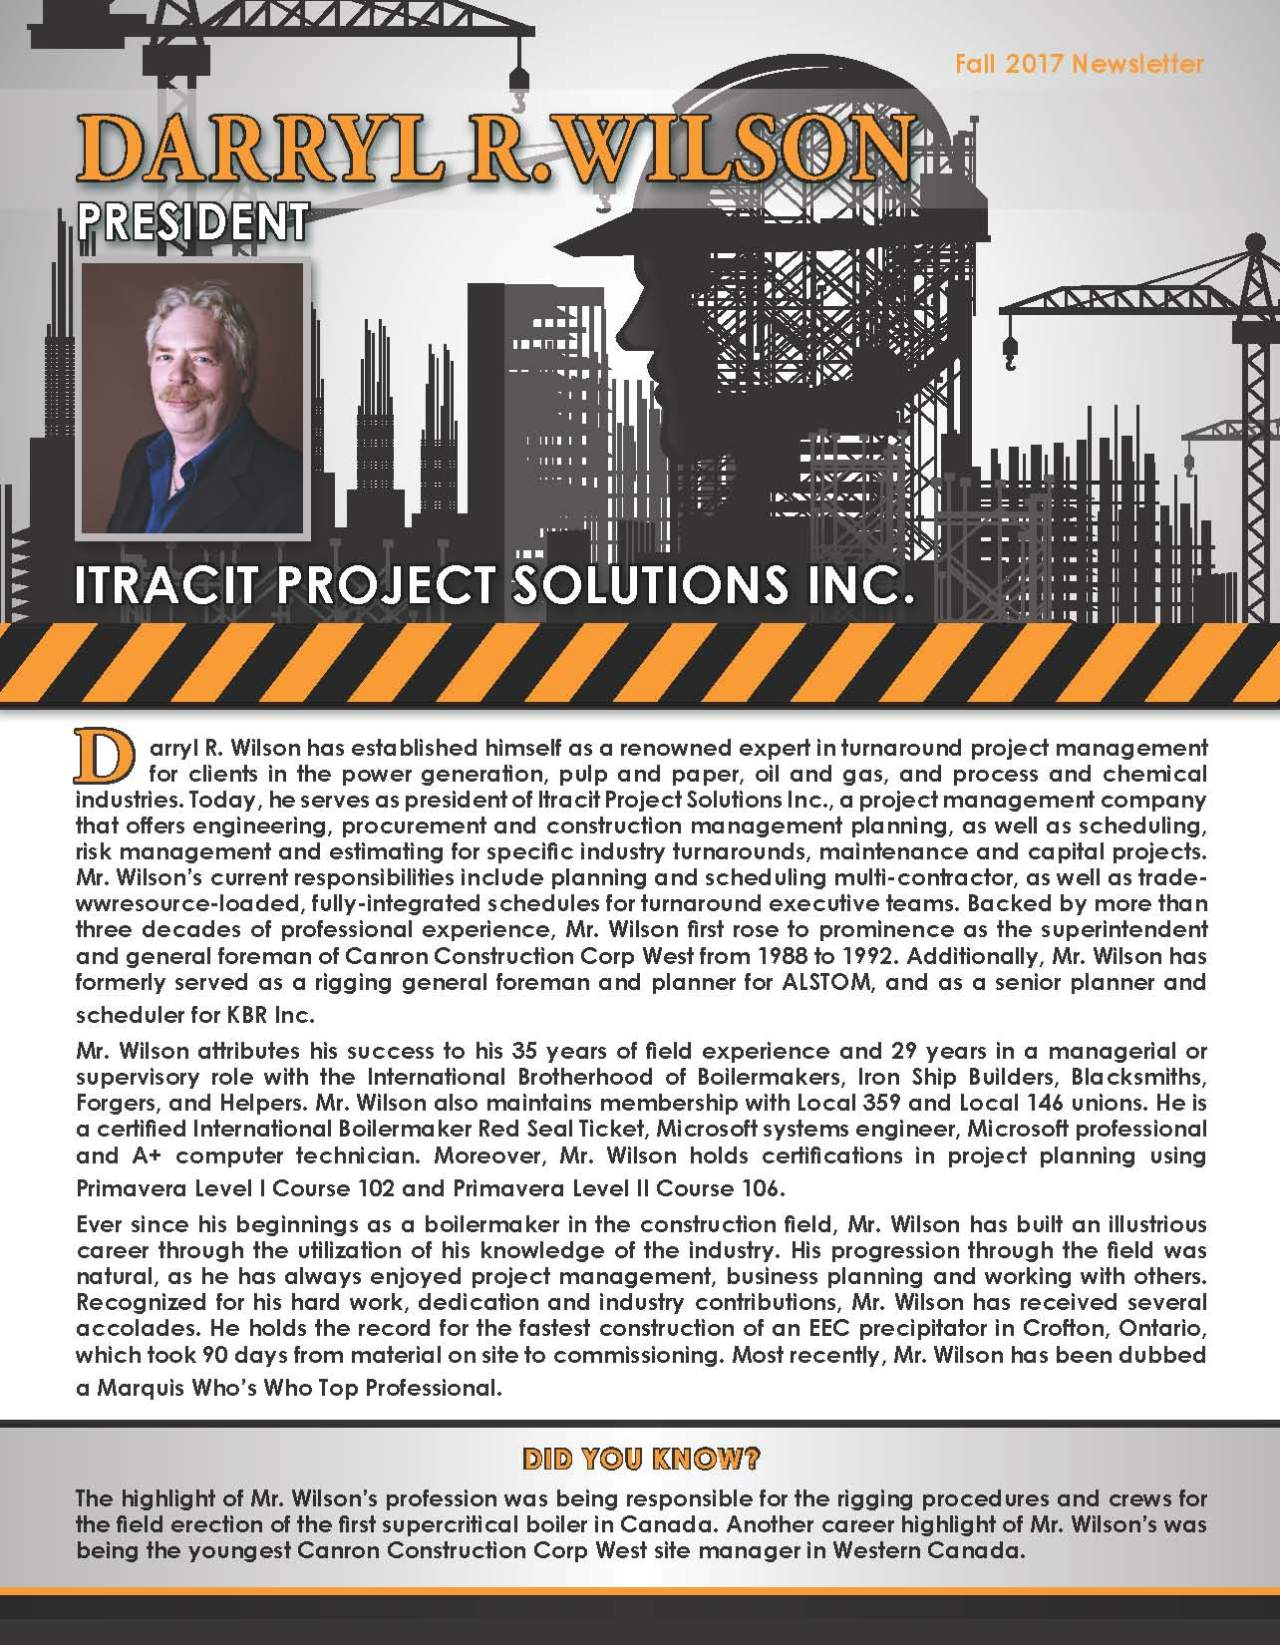 Wilson, Darryl 1593562_40004208 Newsletter